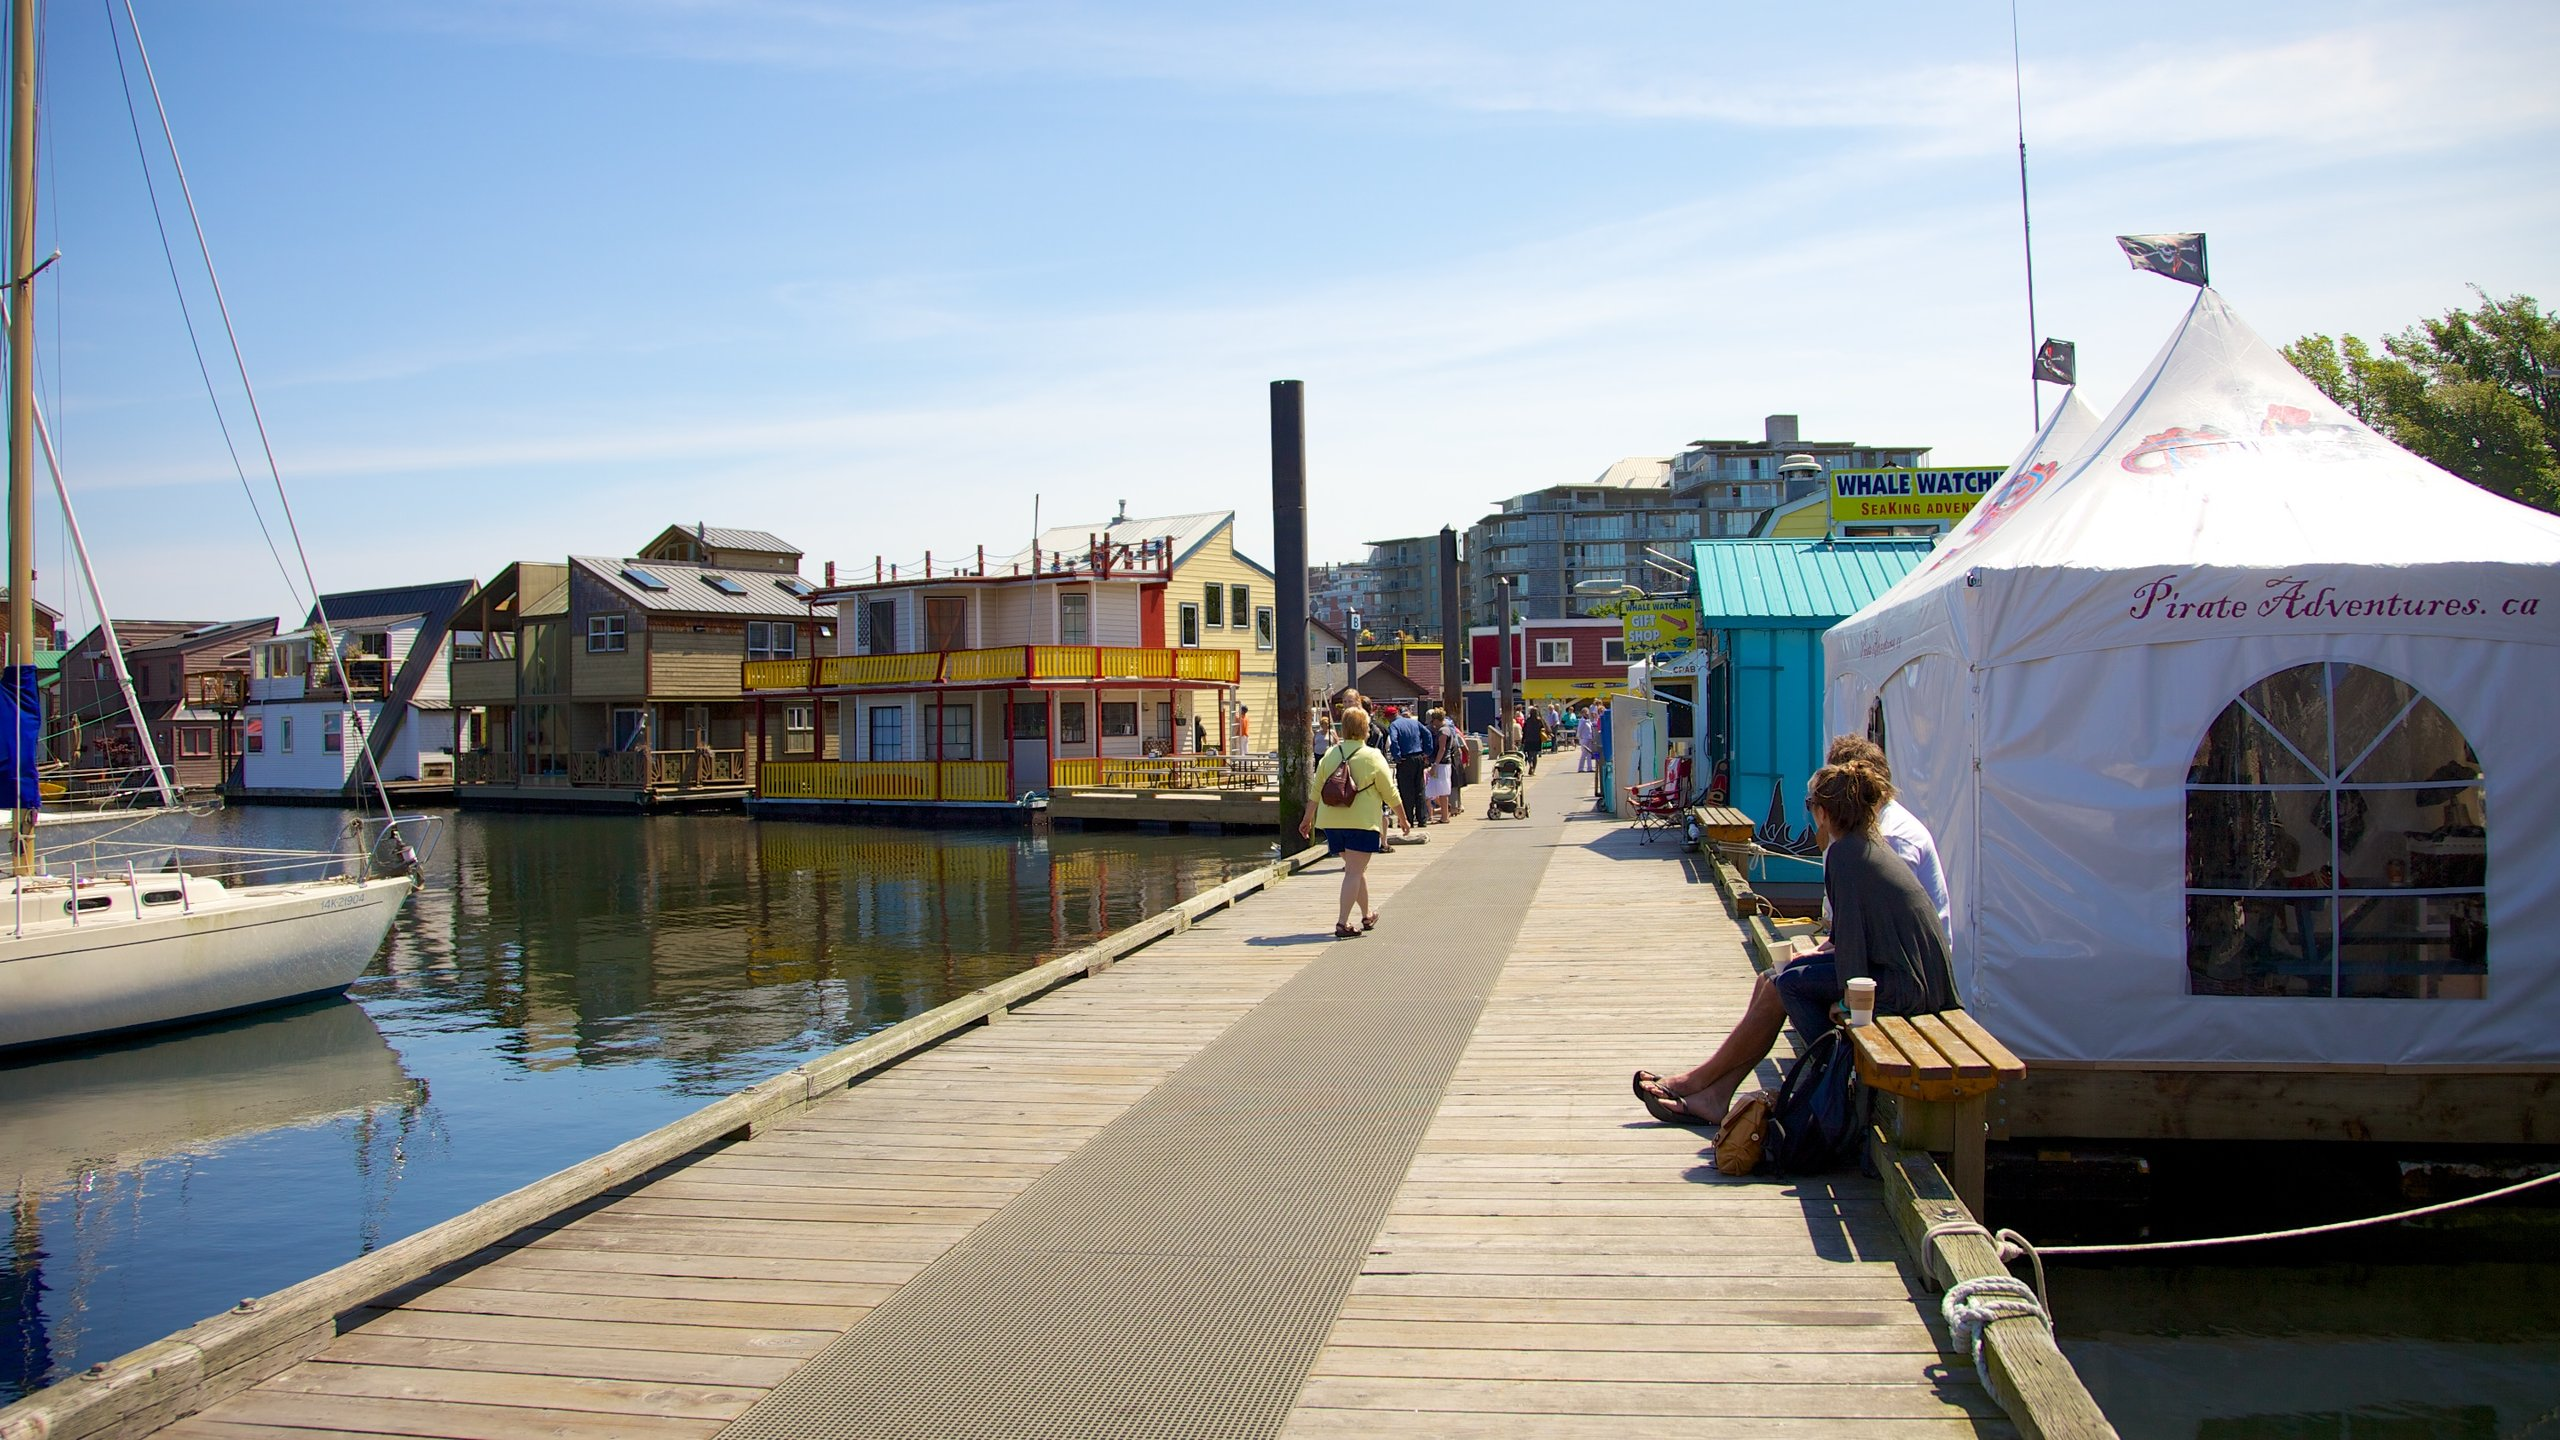 James Bay, Victoria, British Columbia, Canada